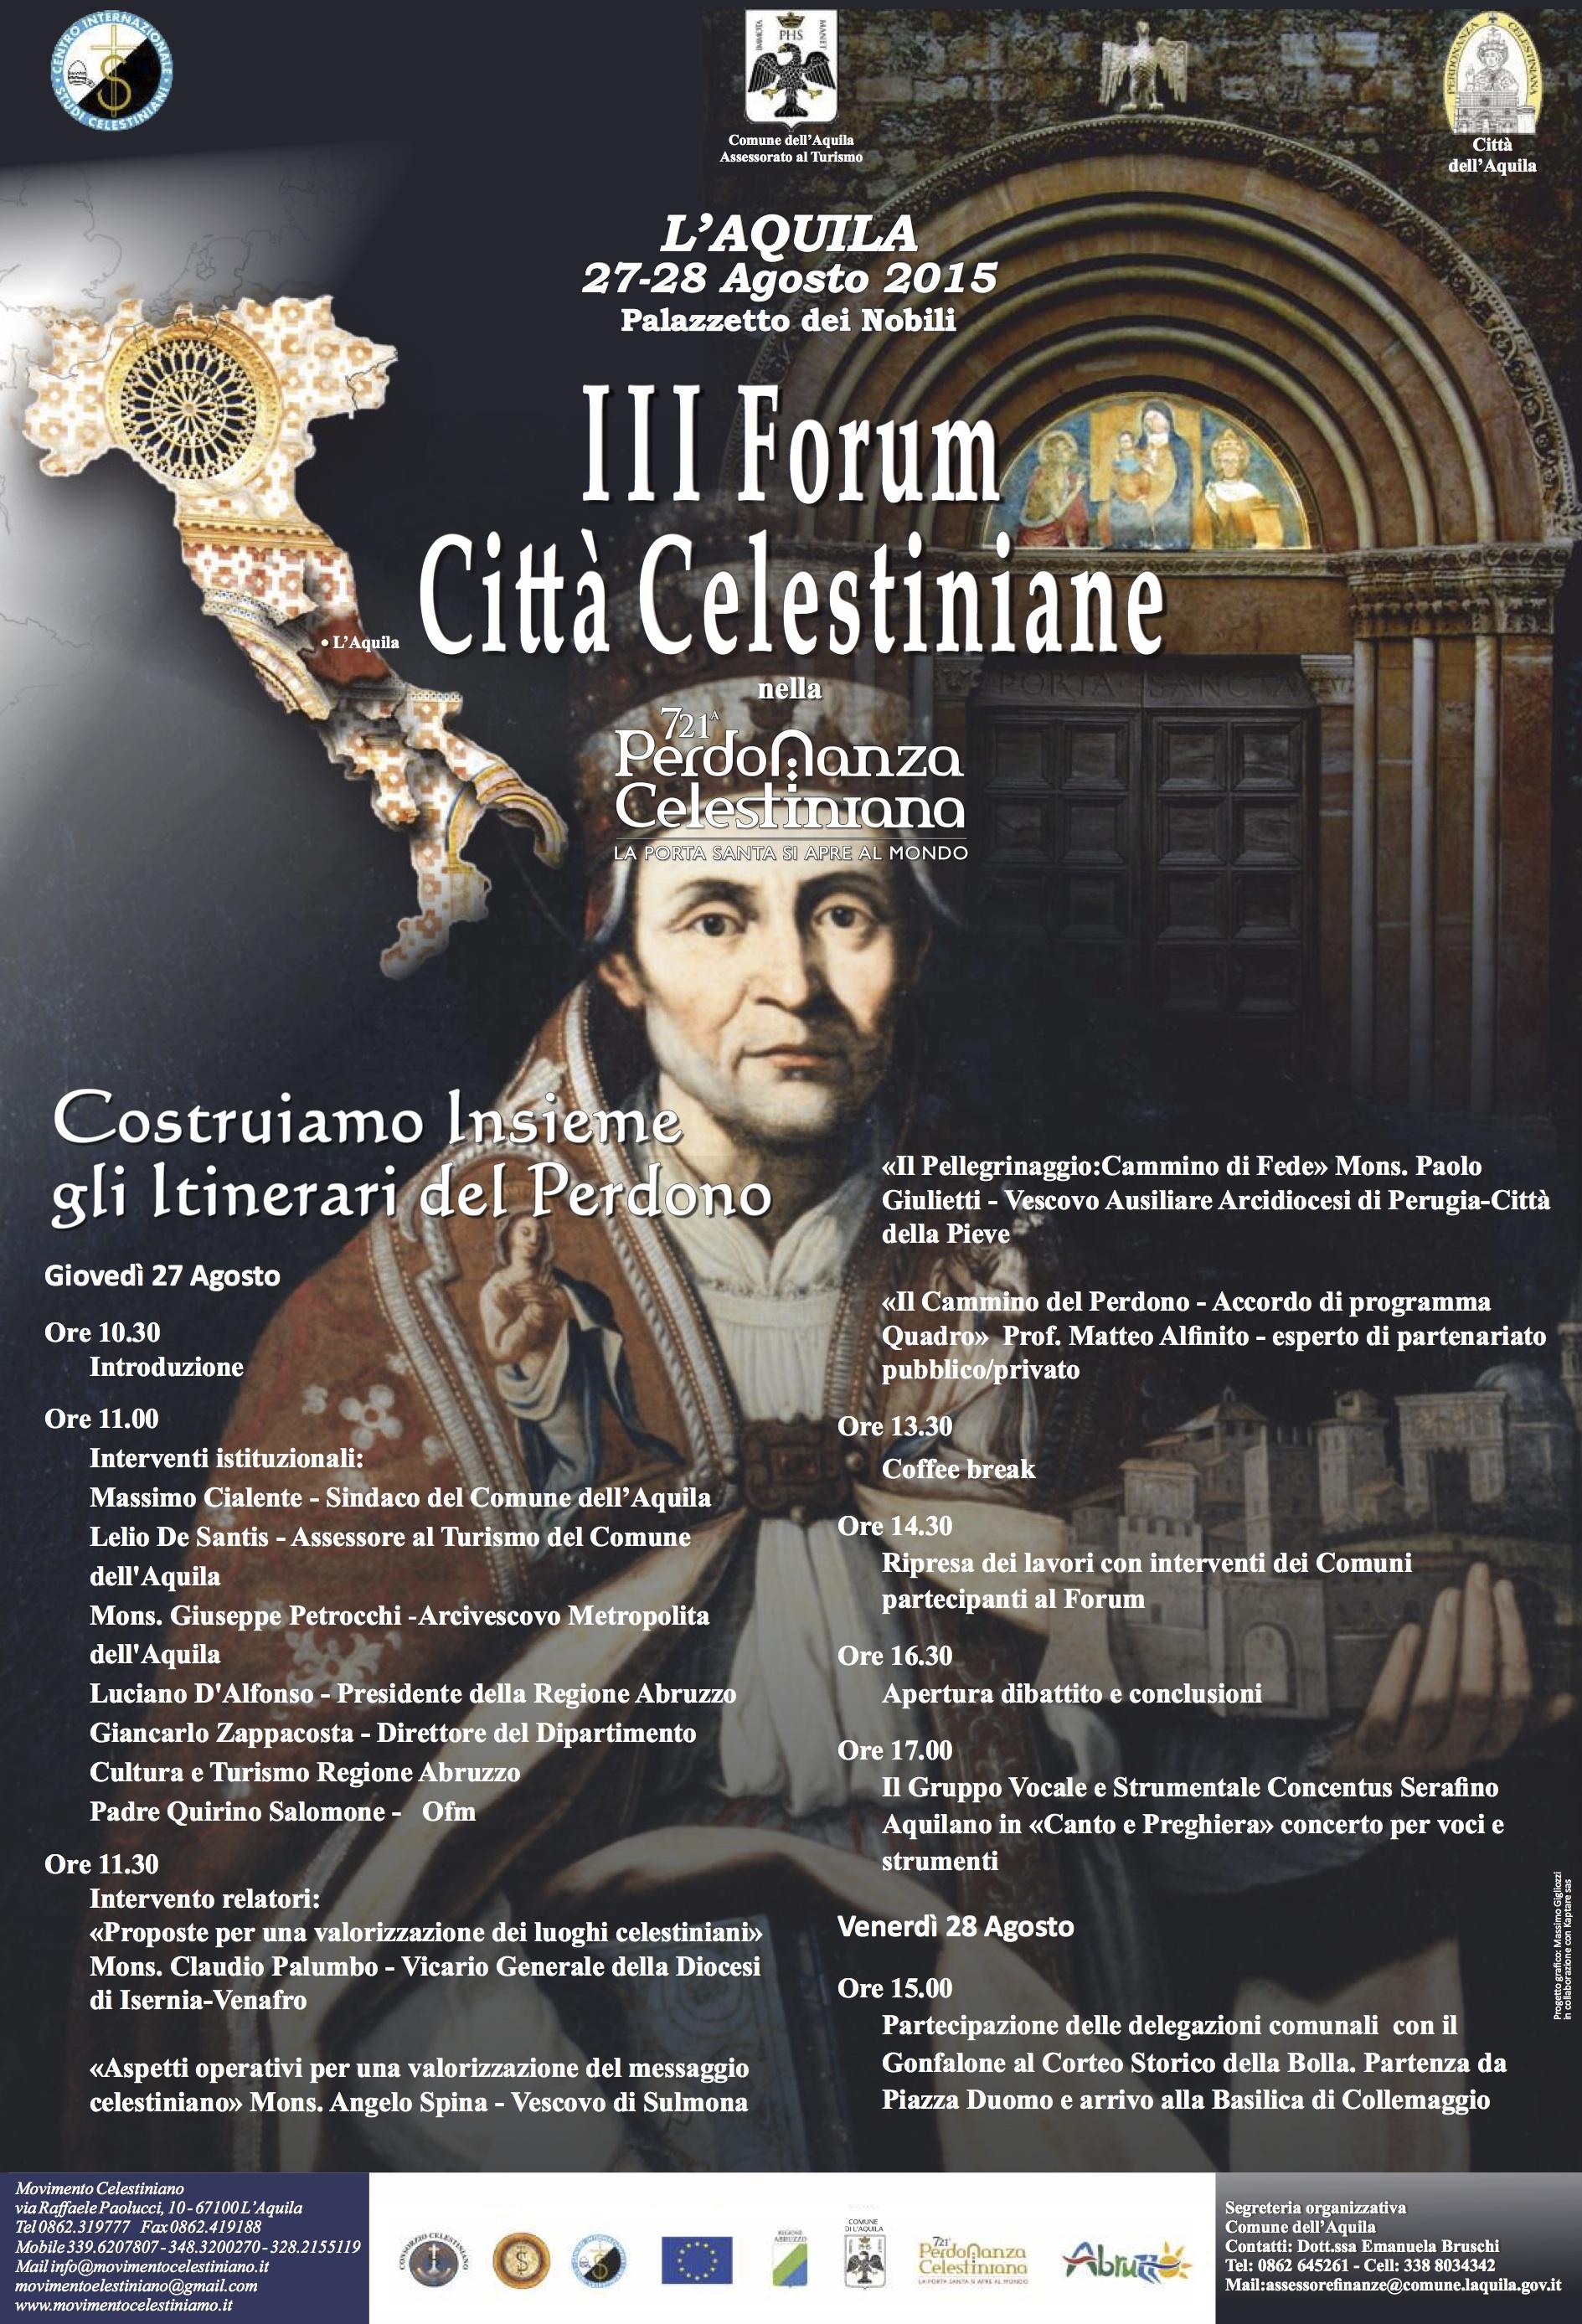 forum città celestiniane